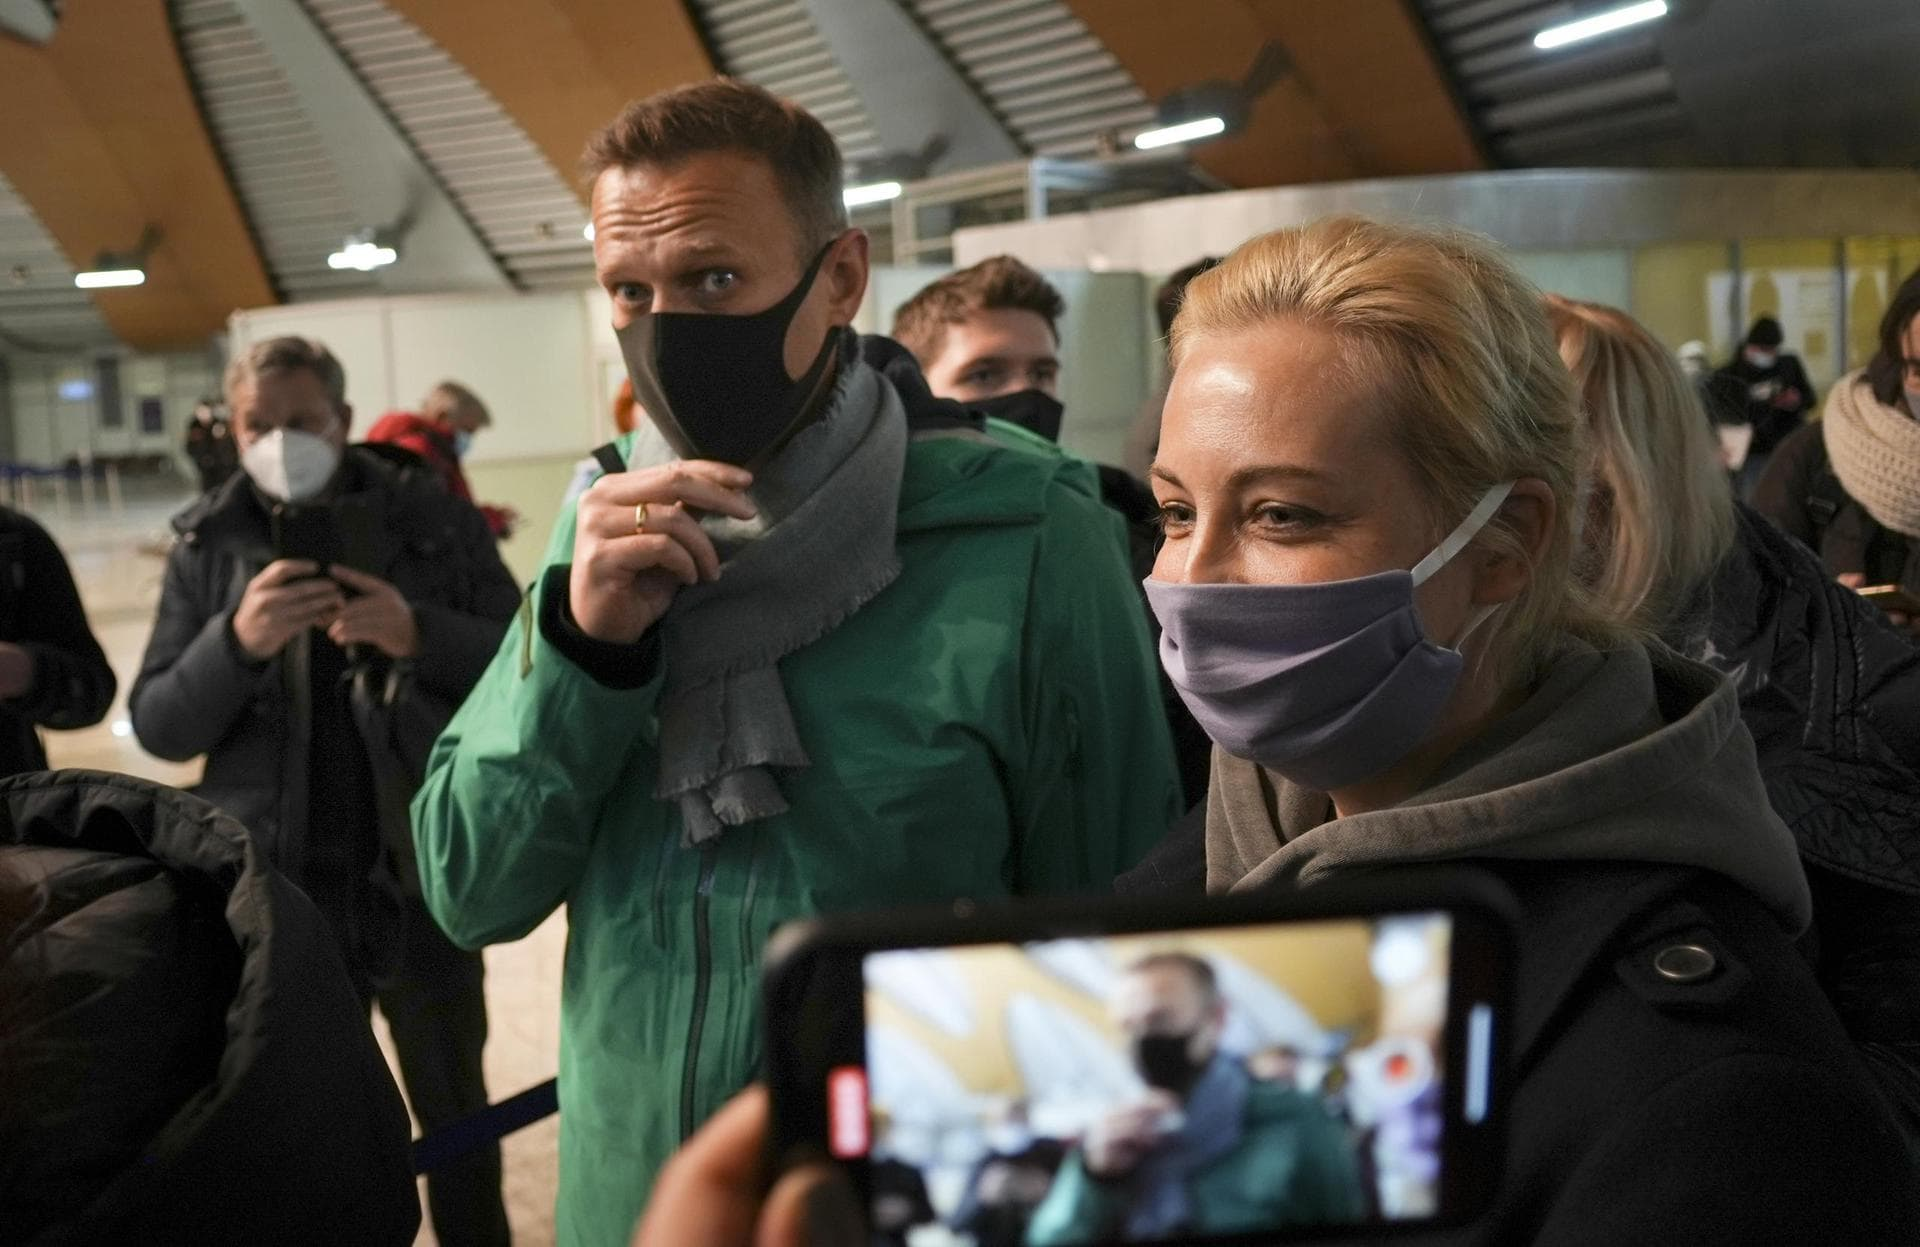 Nawalny-Team: Verbleib des Kremlkritikers unklar Nach Festnahme